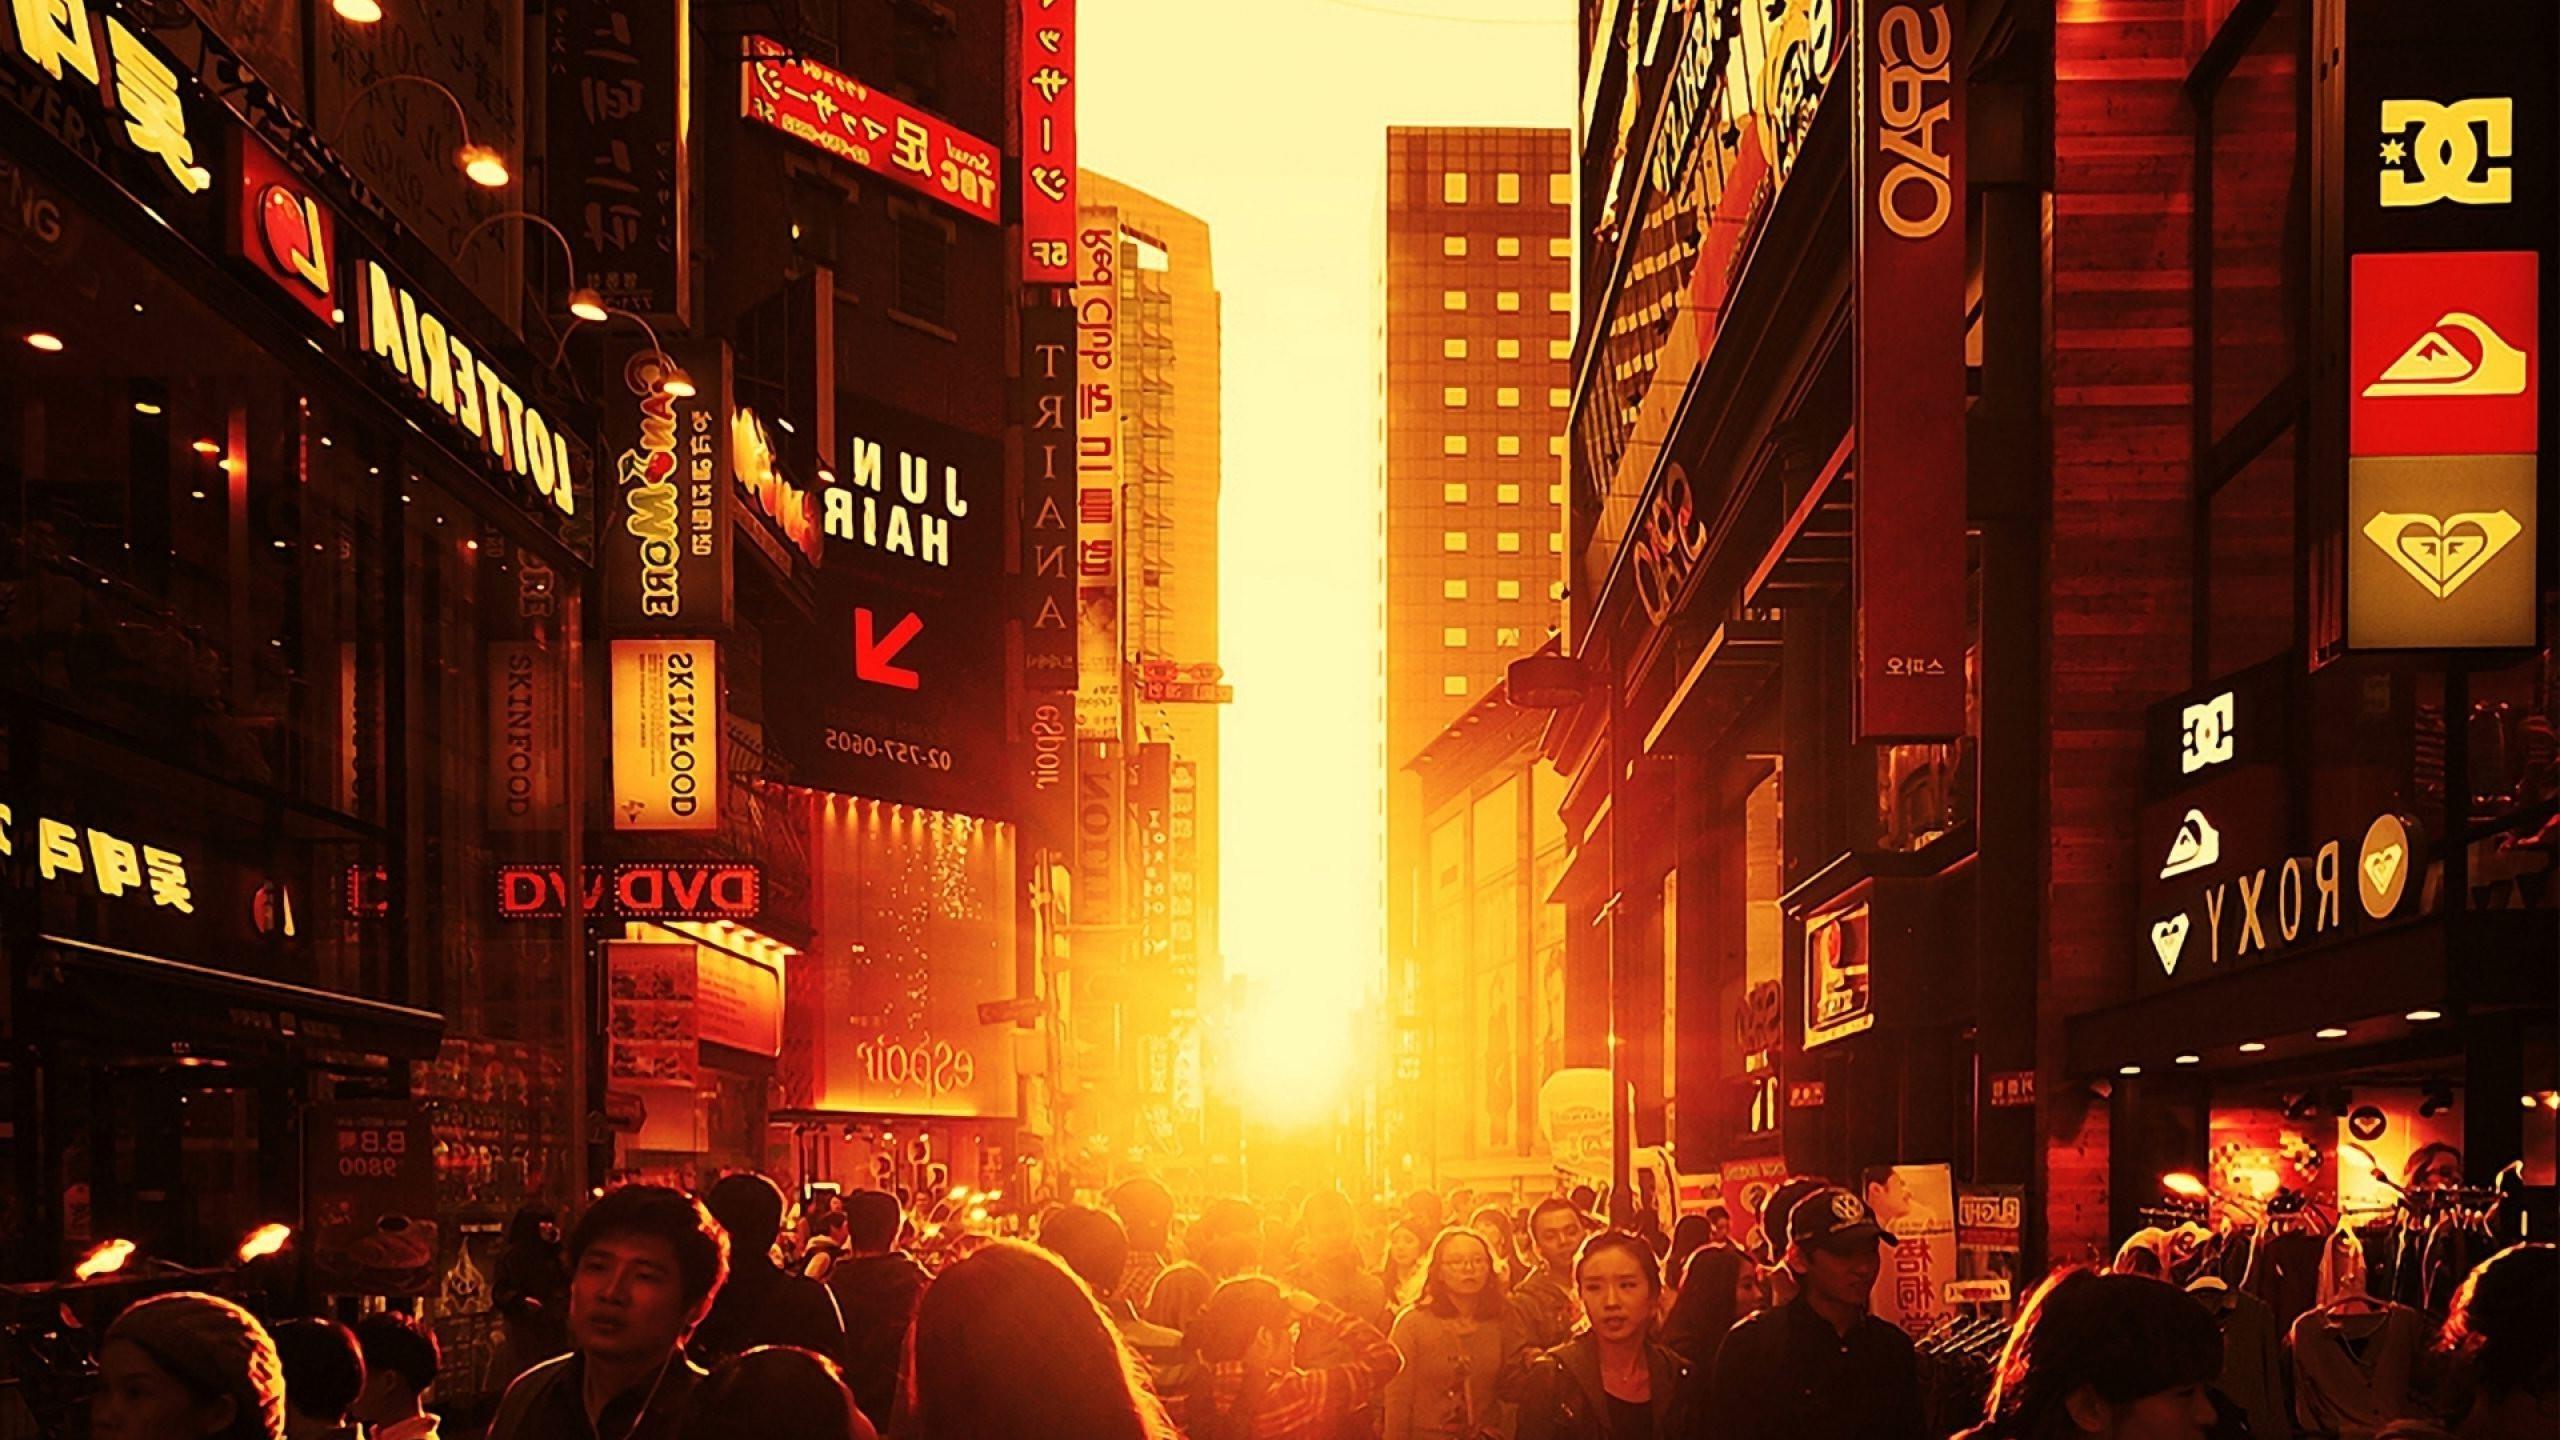 Simple Wallpaper Night Evening - sunlight-sunset-city-street-night-evening-orange-Seoul-South-Korea-pedestrian-crowd-2560x1440-px-517118  You Should Have-15746.jpg